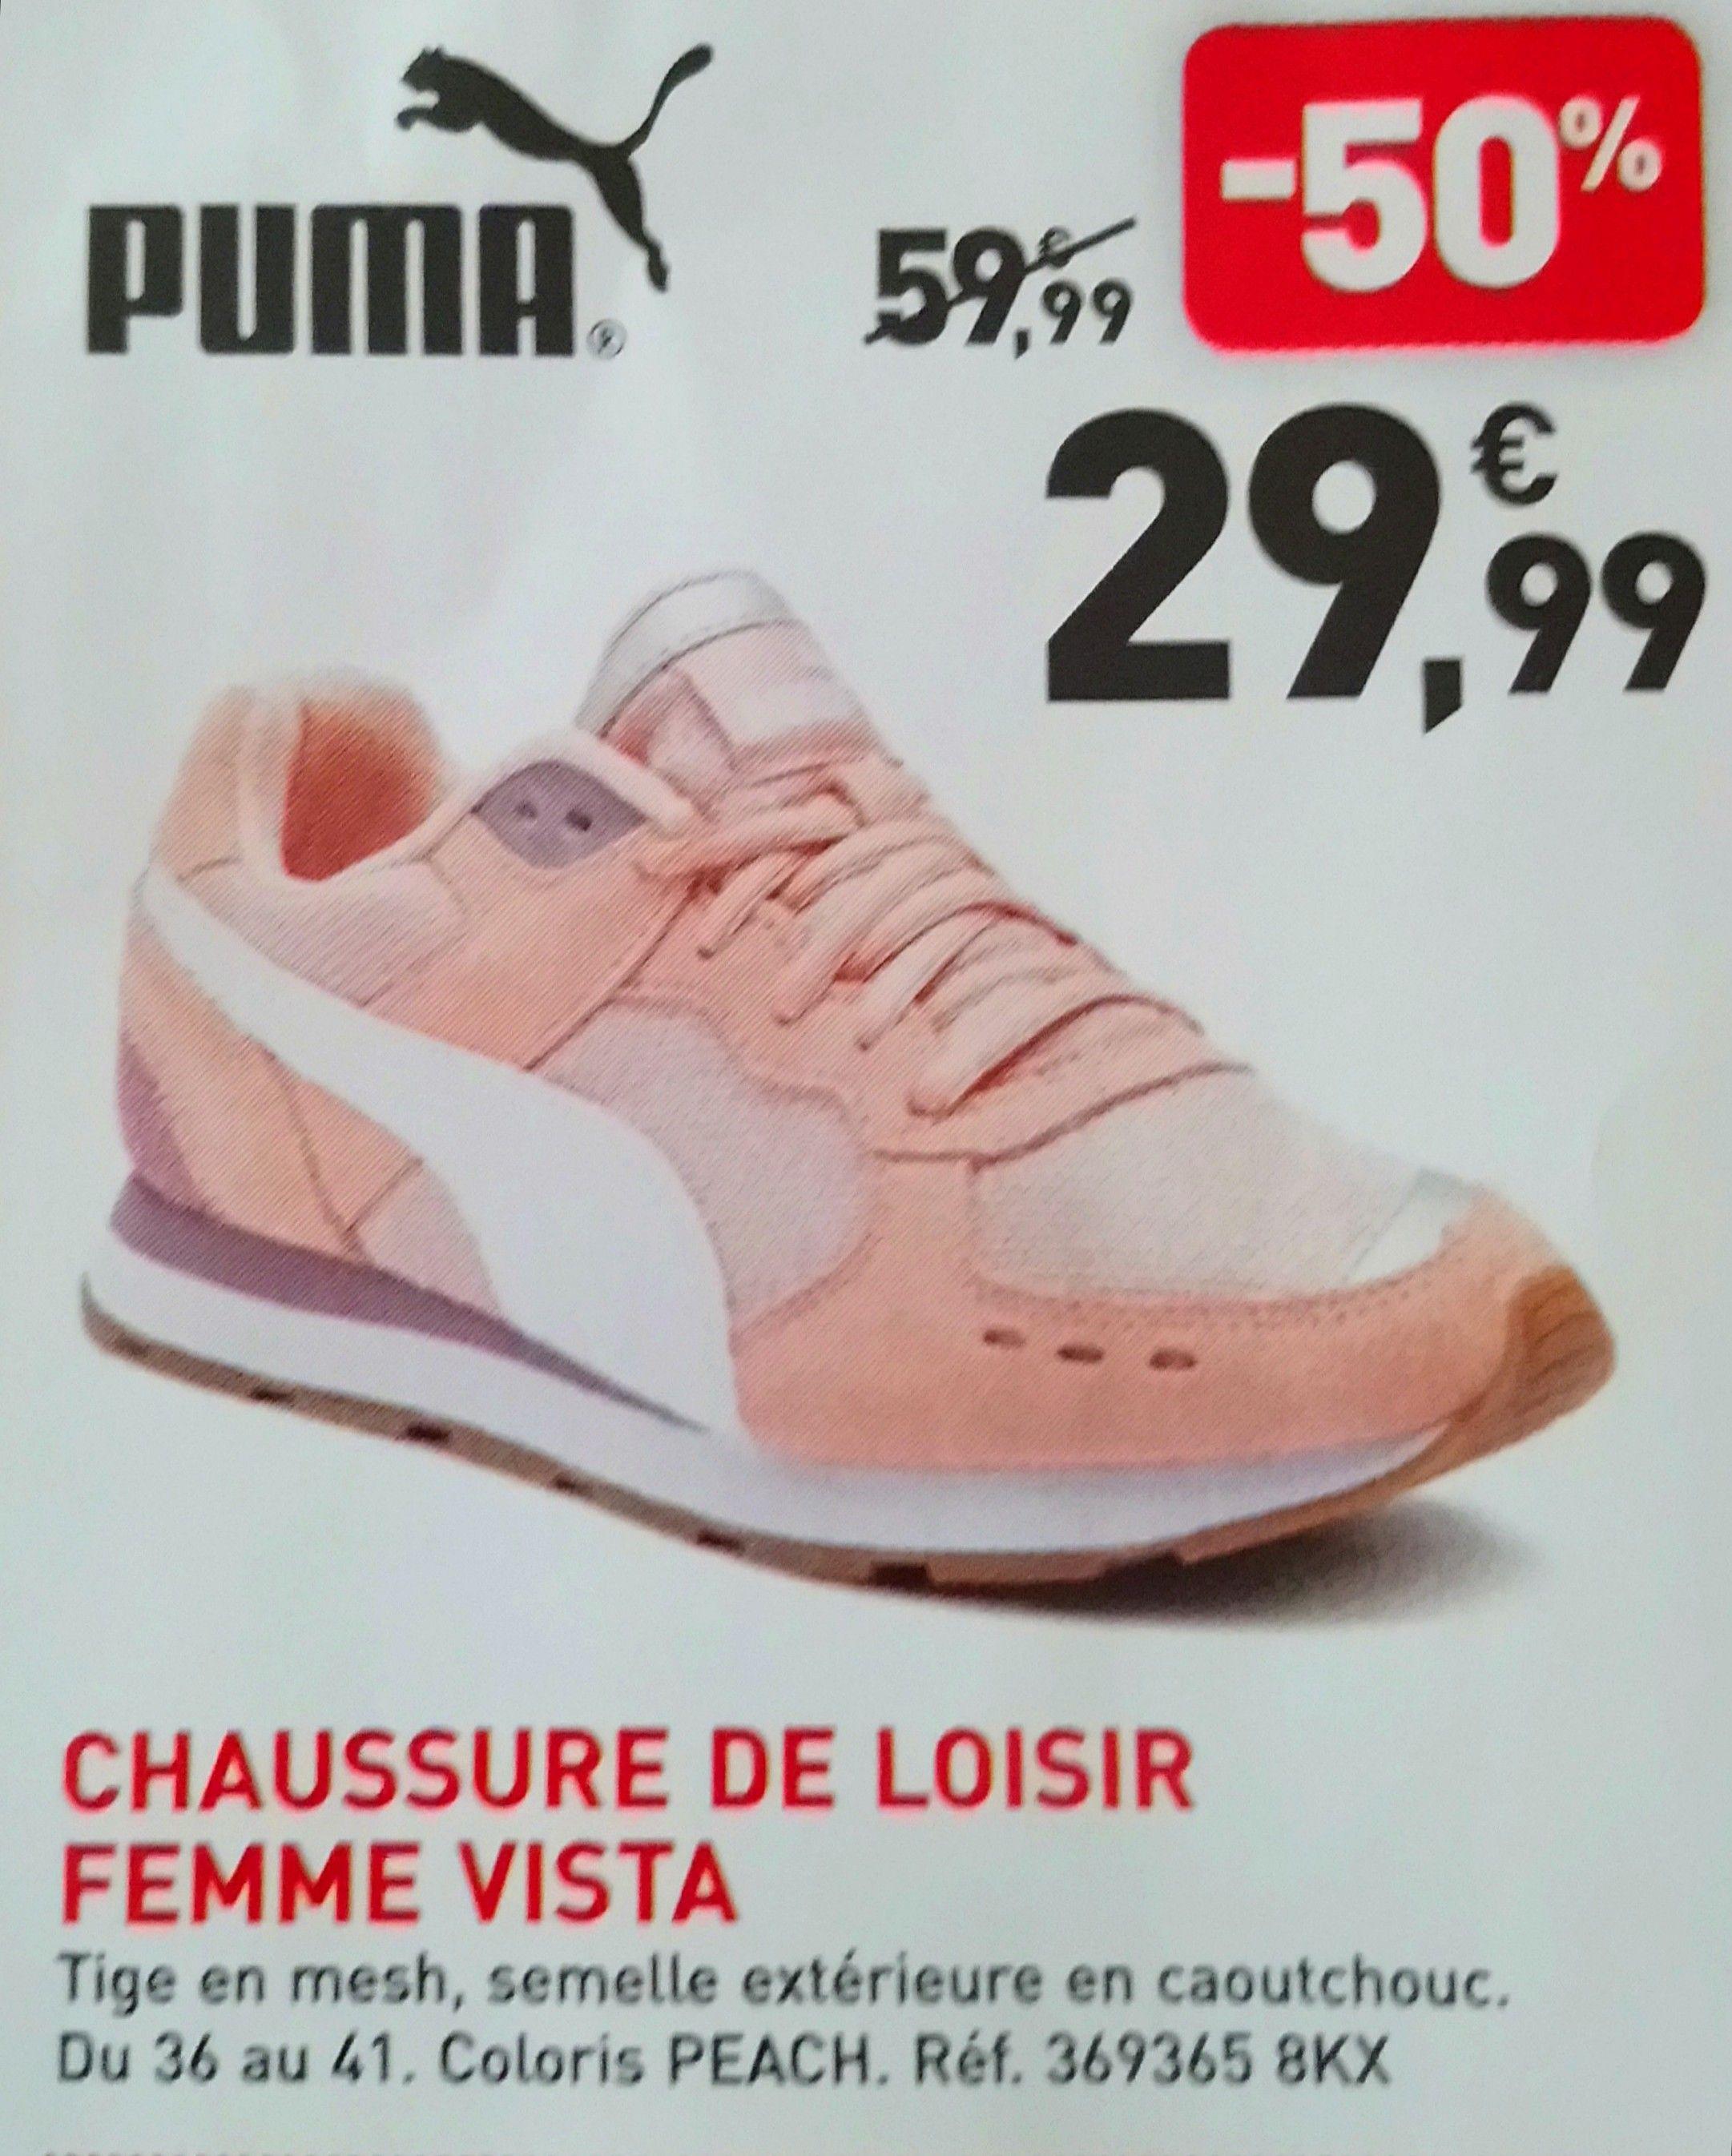 Chaussures Femme Puma Vista RoseBlanc –